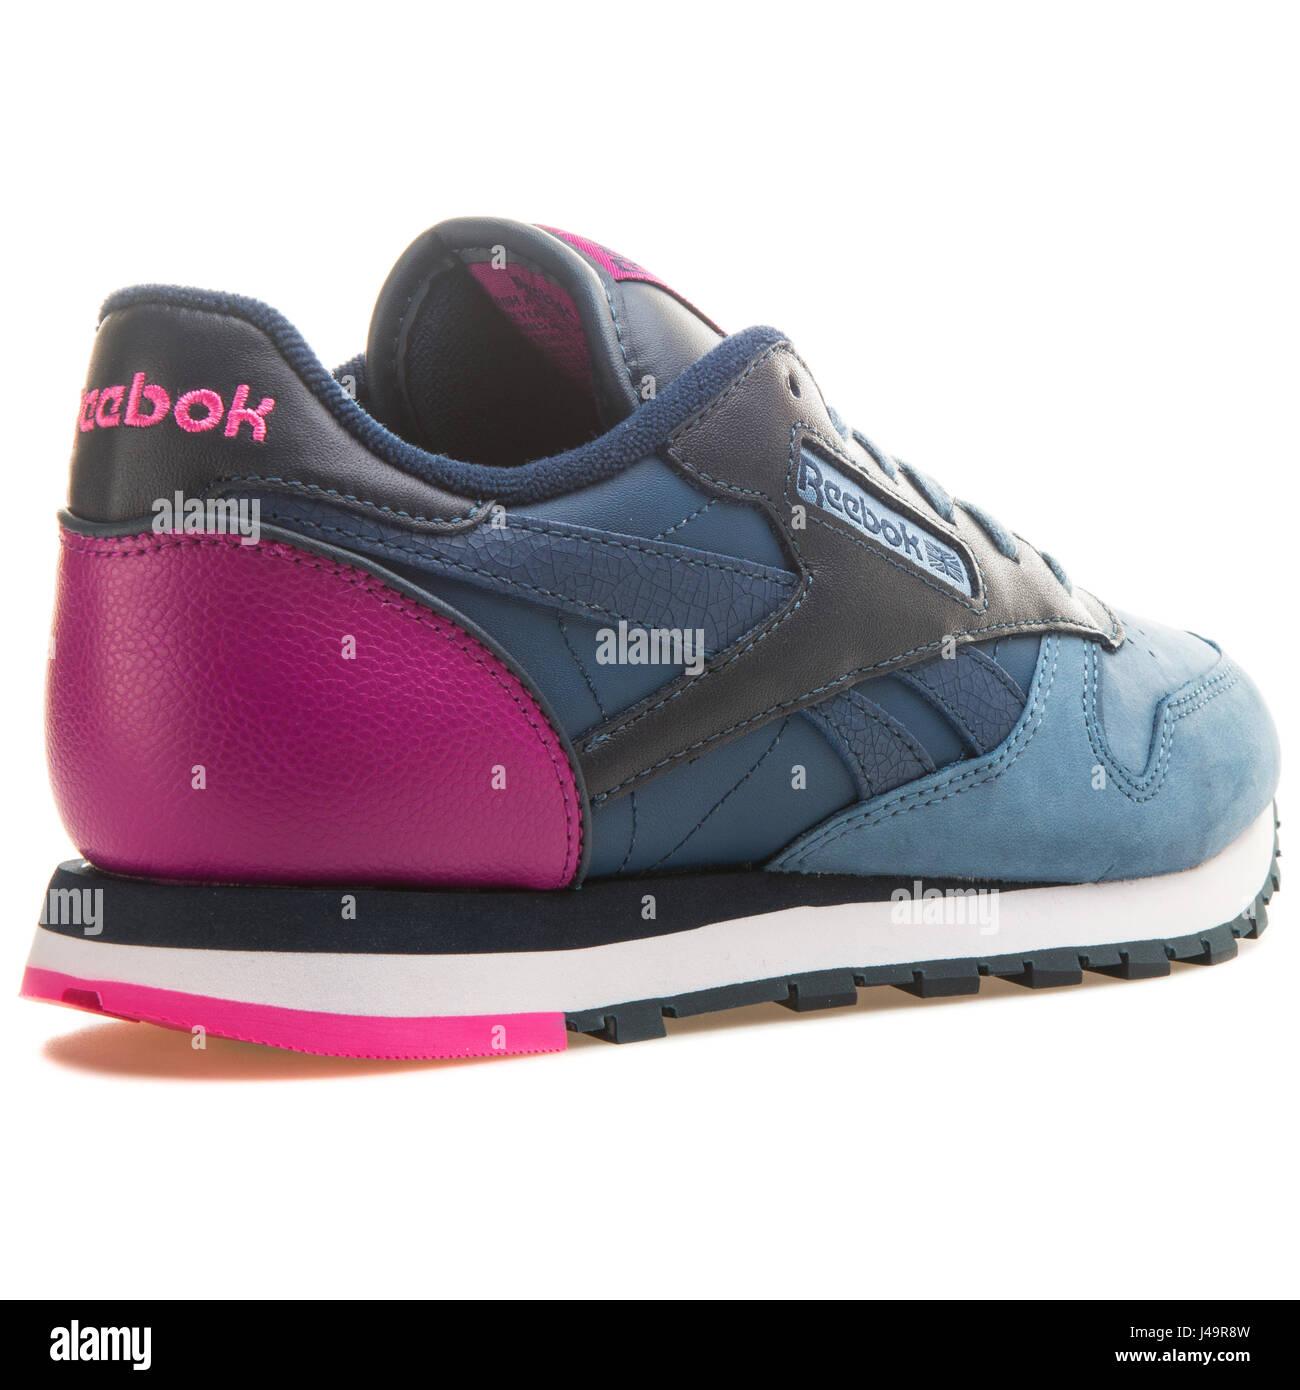 03f94bb43e3 Reebok CL LTHR PM Blue Slate - V66301 - Stock Image